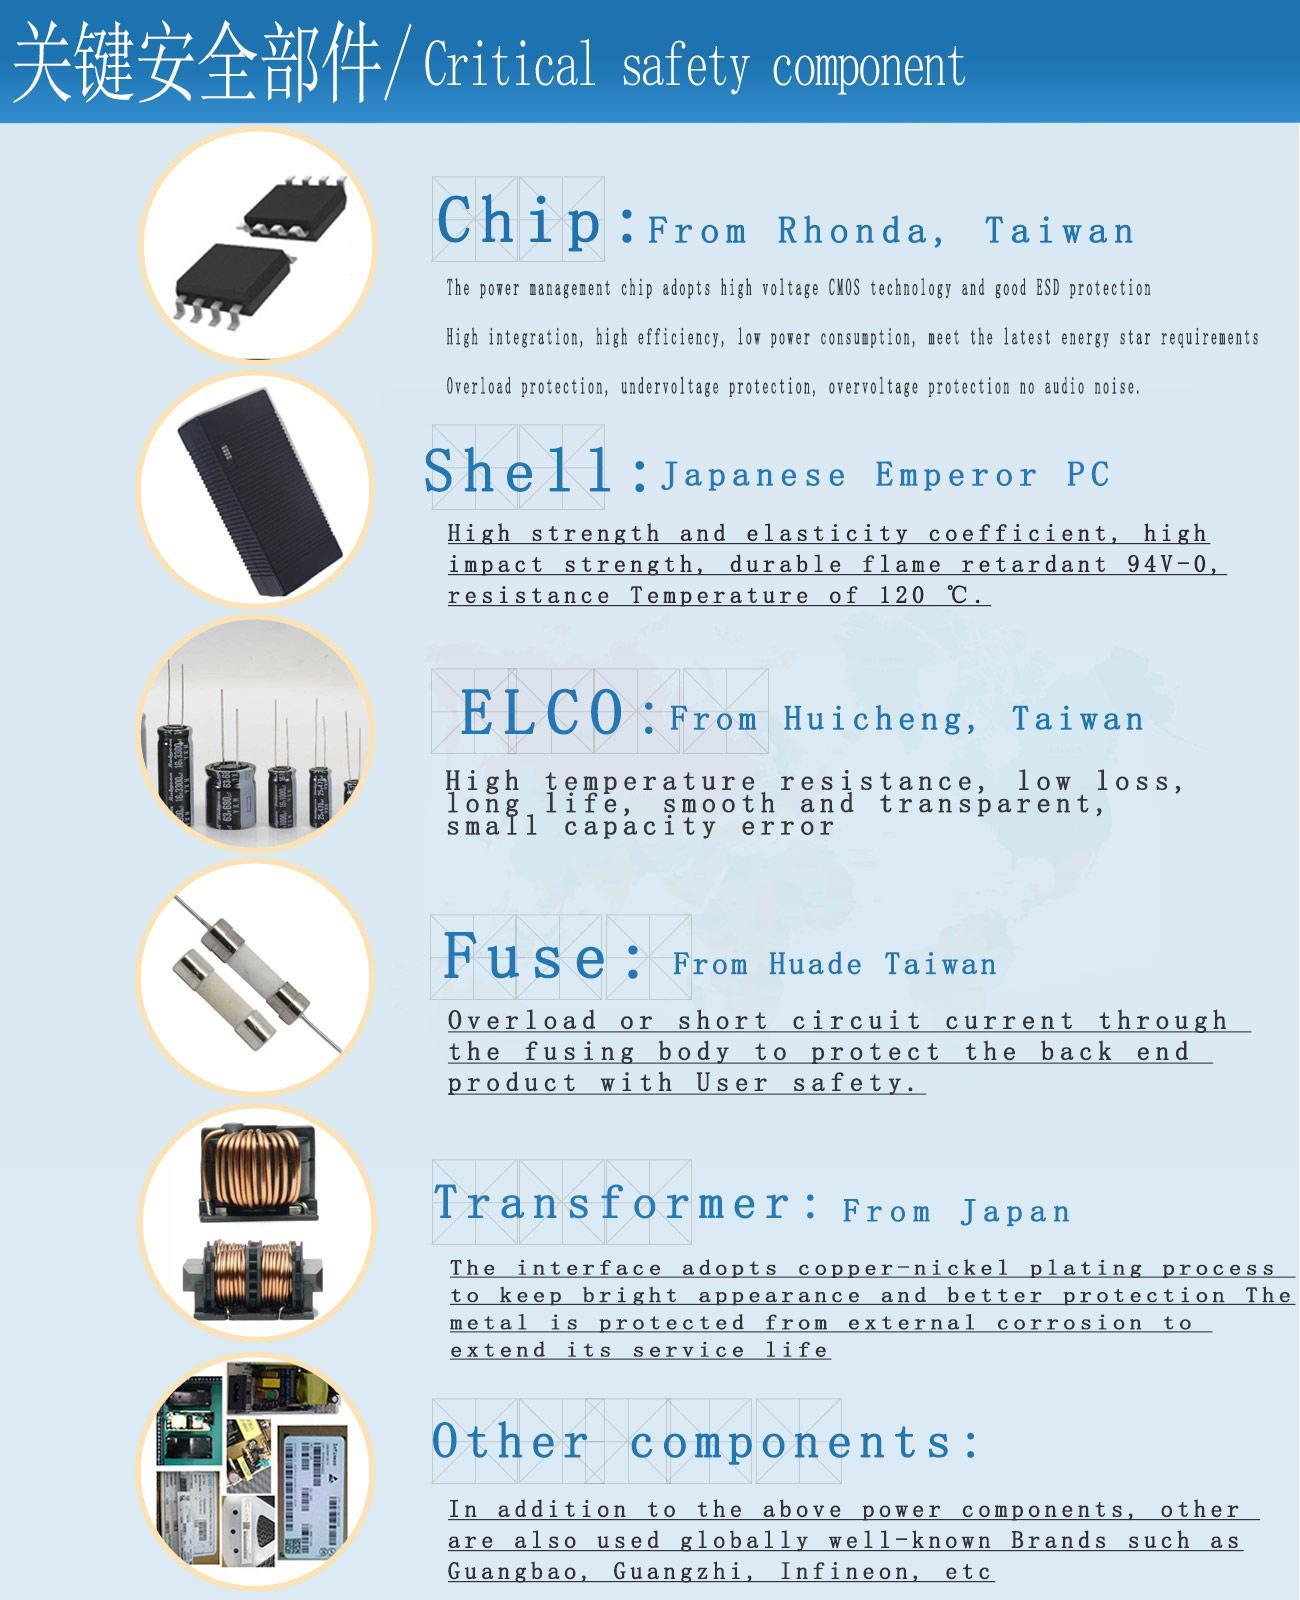 16.8V10A鋰電池充電器 UL GS PSE認証4串鋰電池組充電器 5